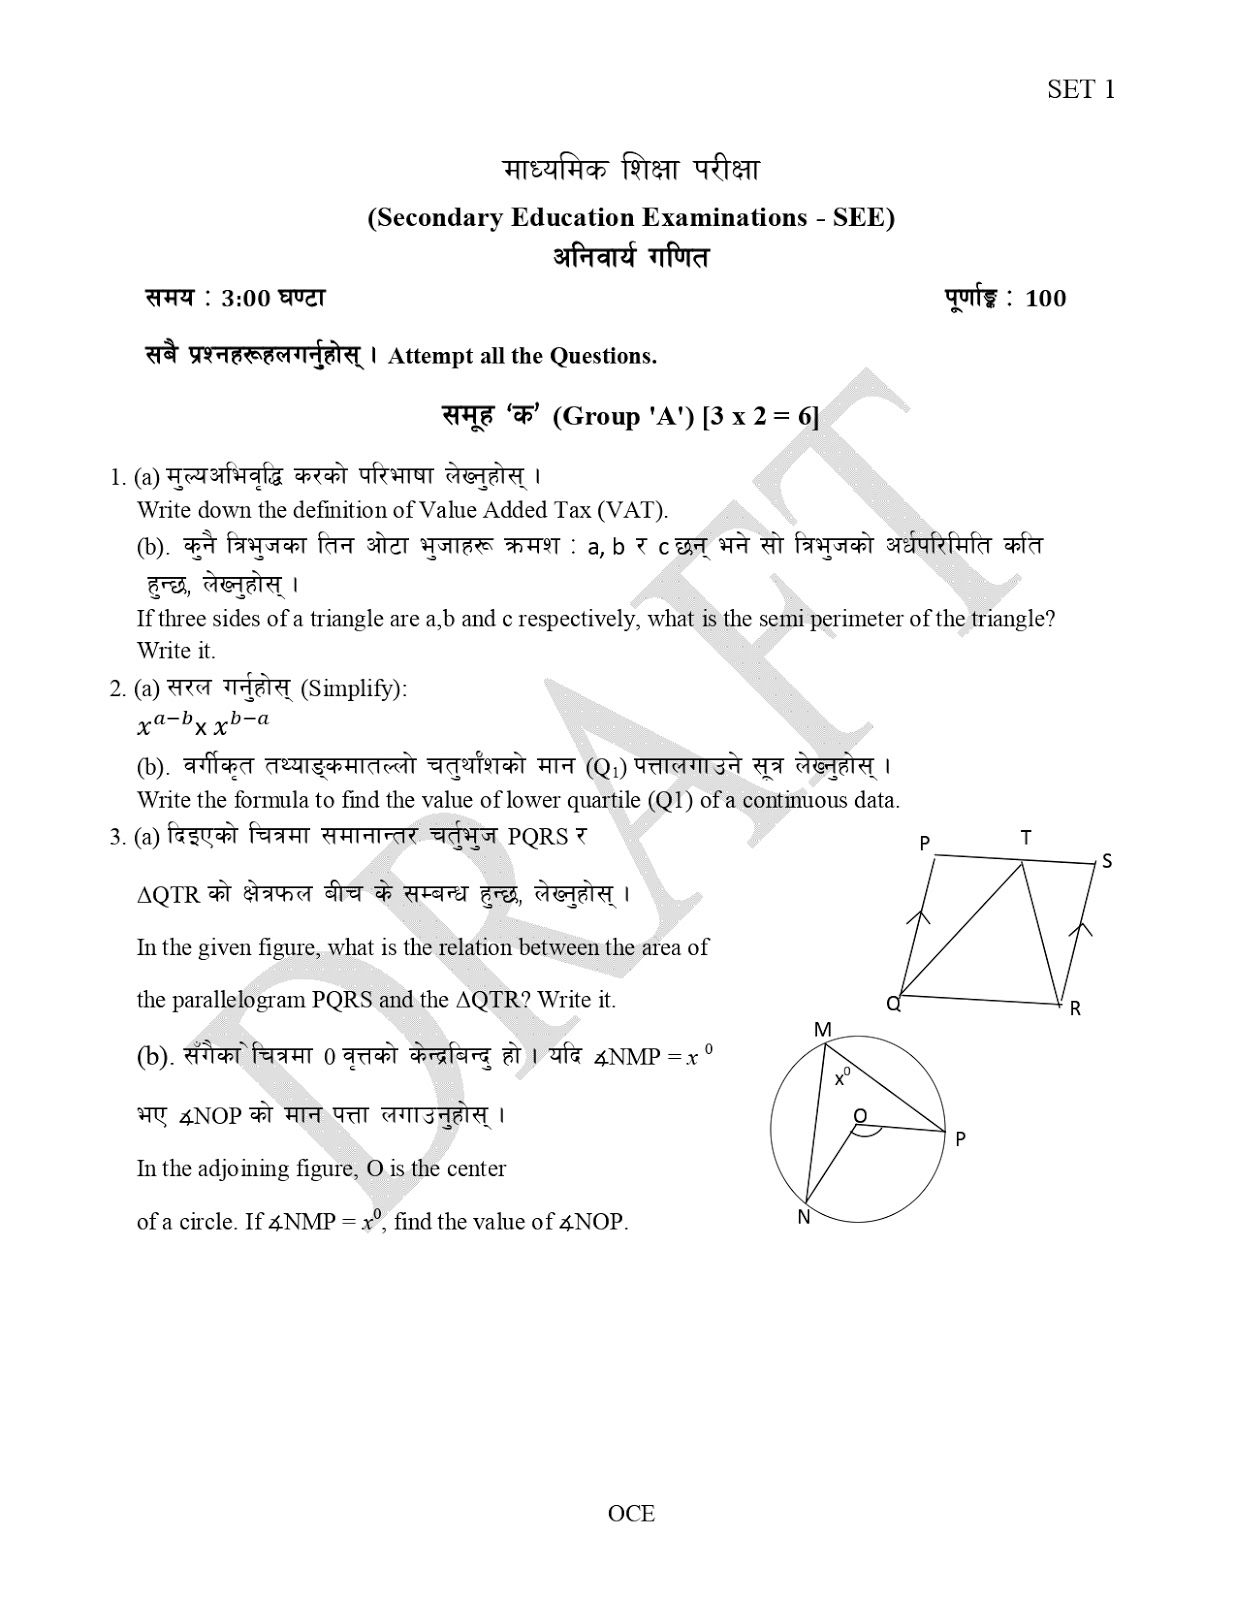 SEE Compulsory Math Model Question   2075 [2019]   SET 01